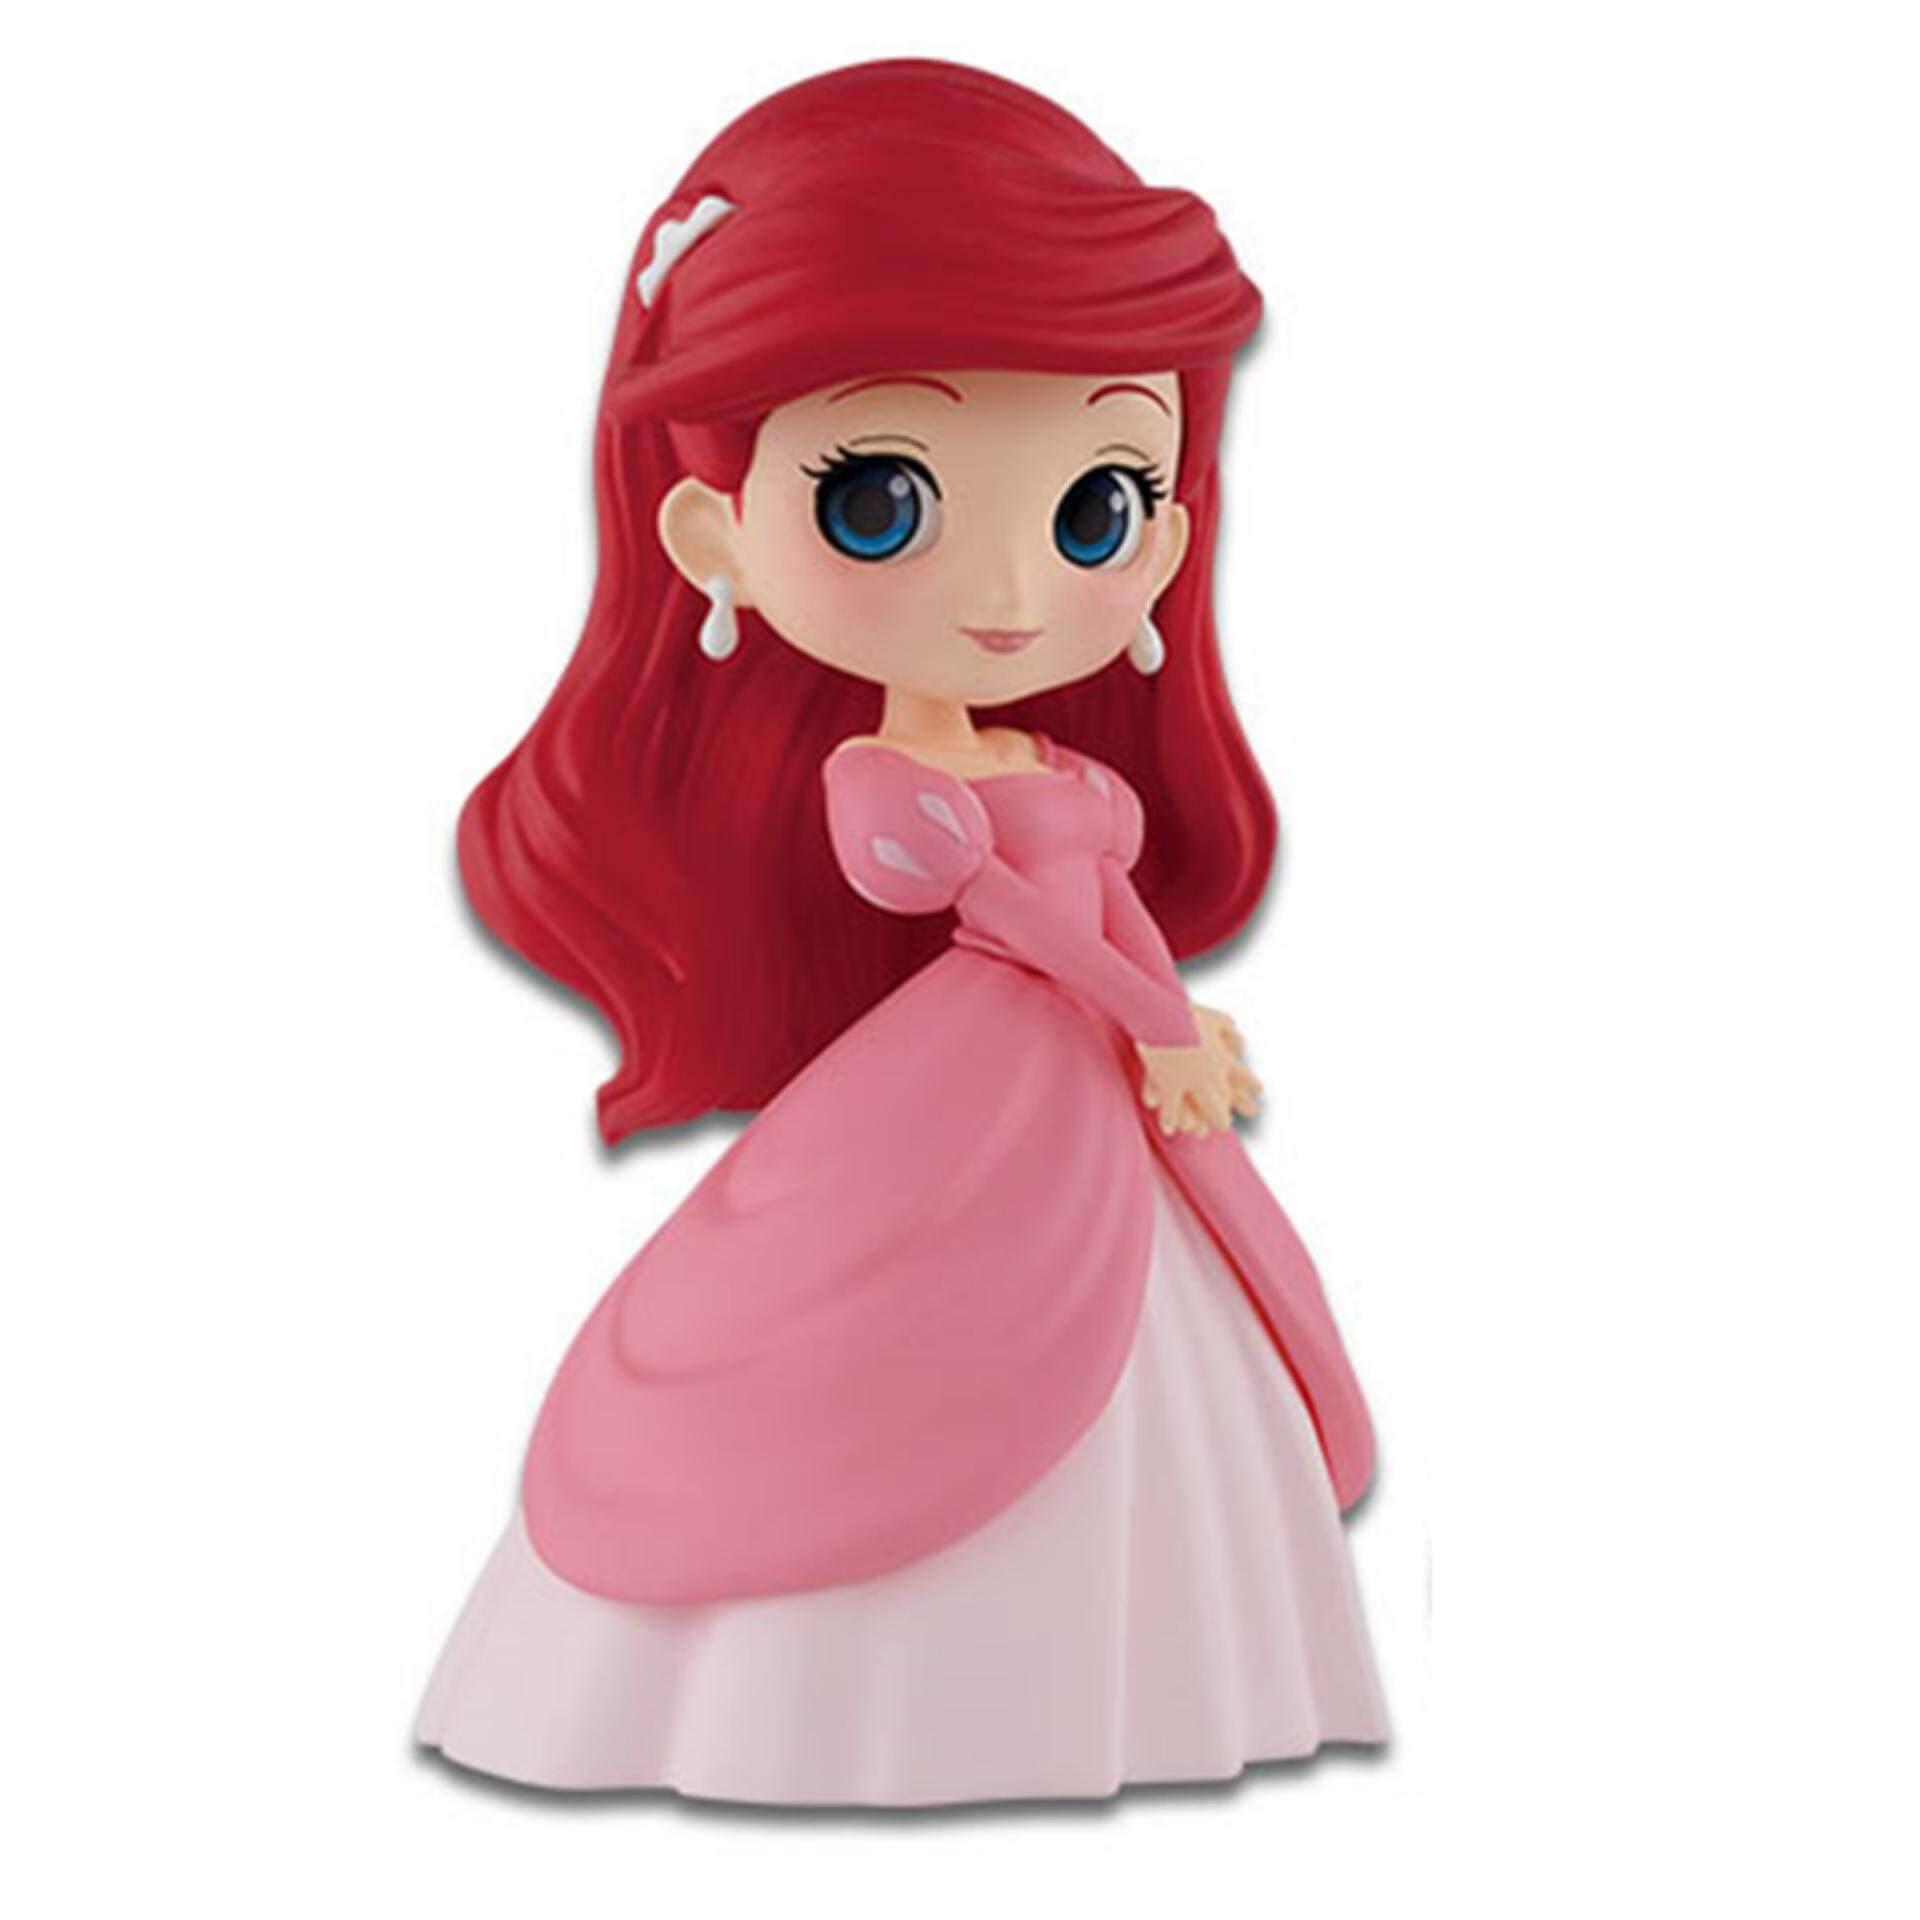 8a1a727f6876 Banpresto Q Posket Disney Princess Petit Figure - Princess Ariel